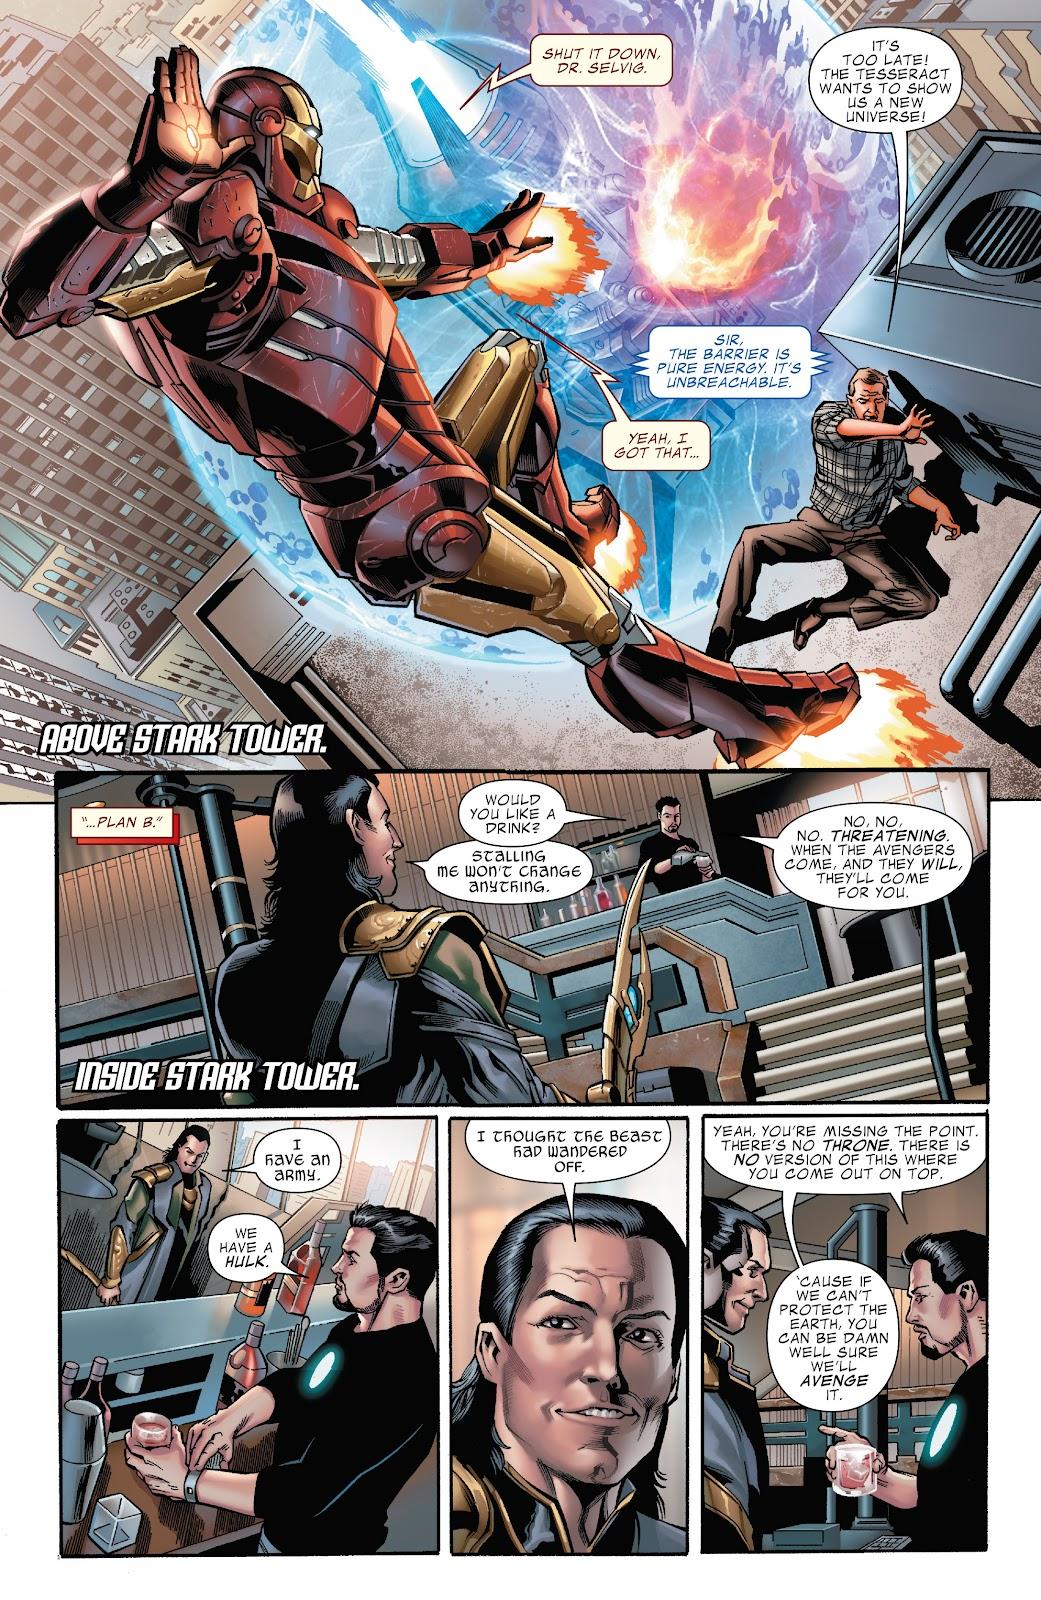 Read online Marvel's The Avengers comic -  Issue #2 - 9